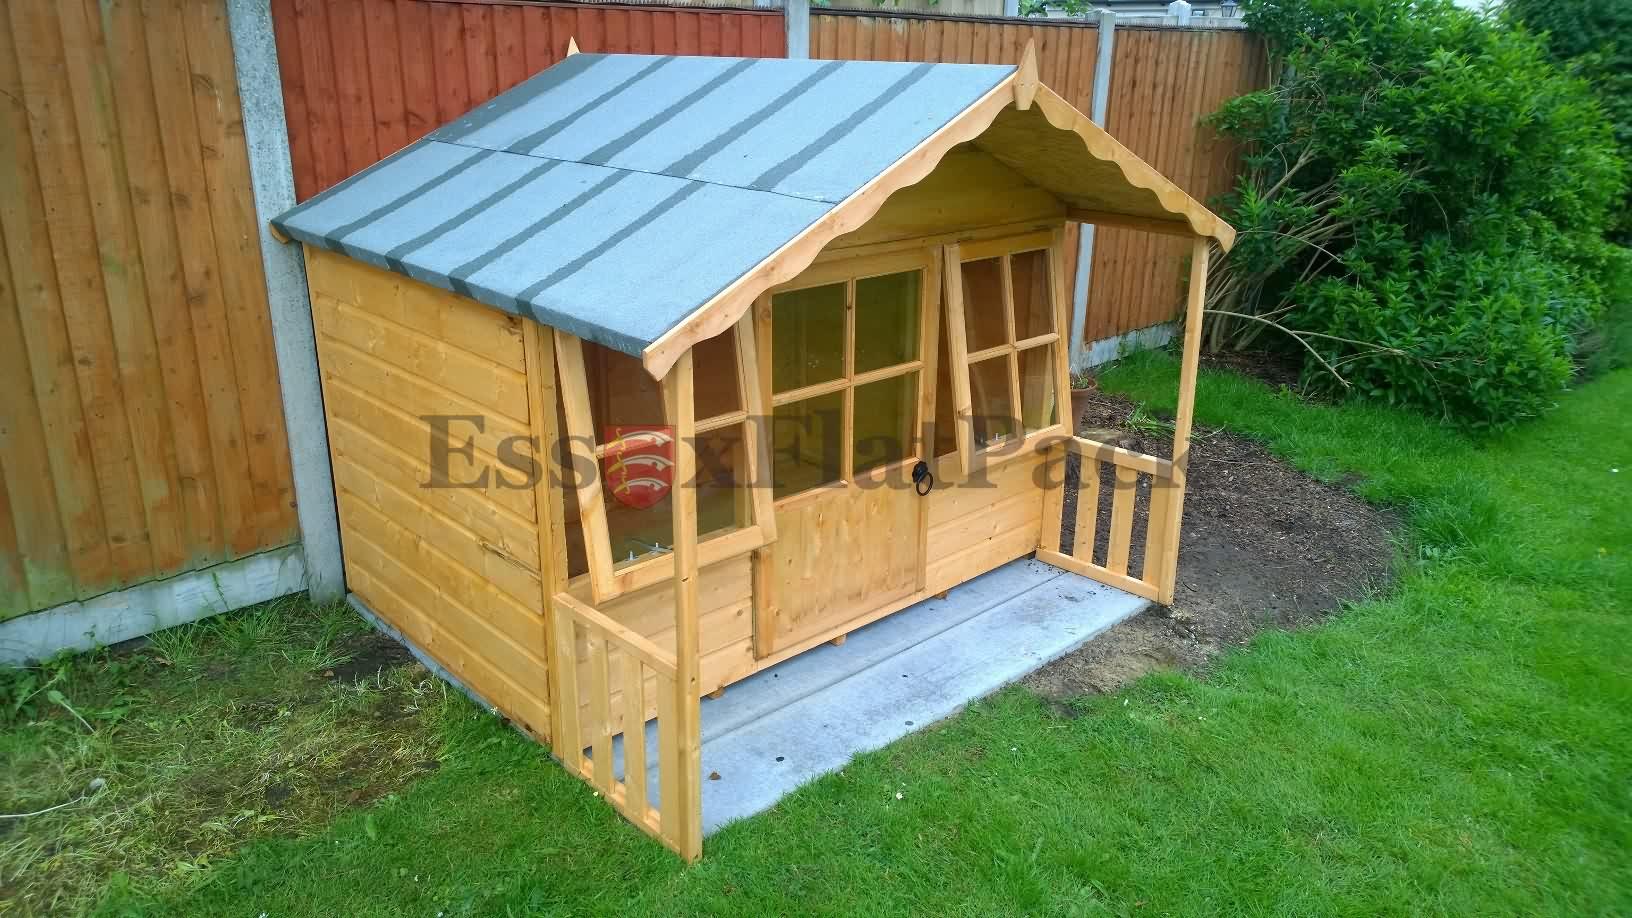 essexflatpack-playhouse-20160613102004.jpg